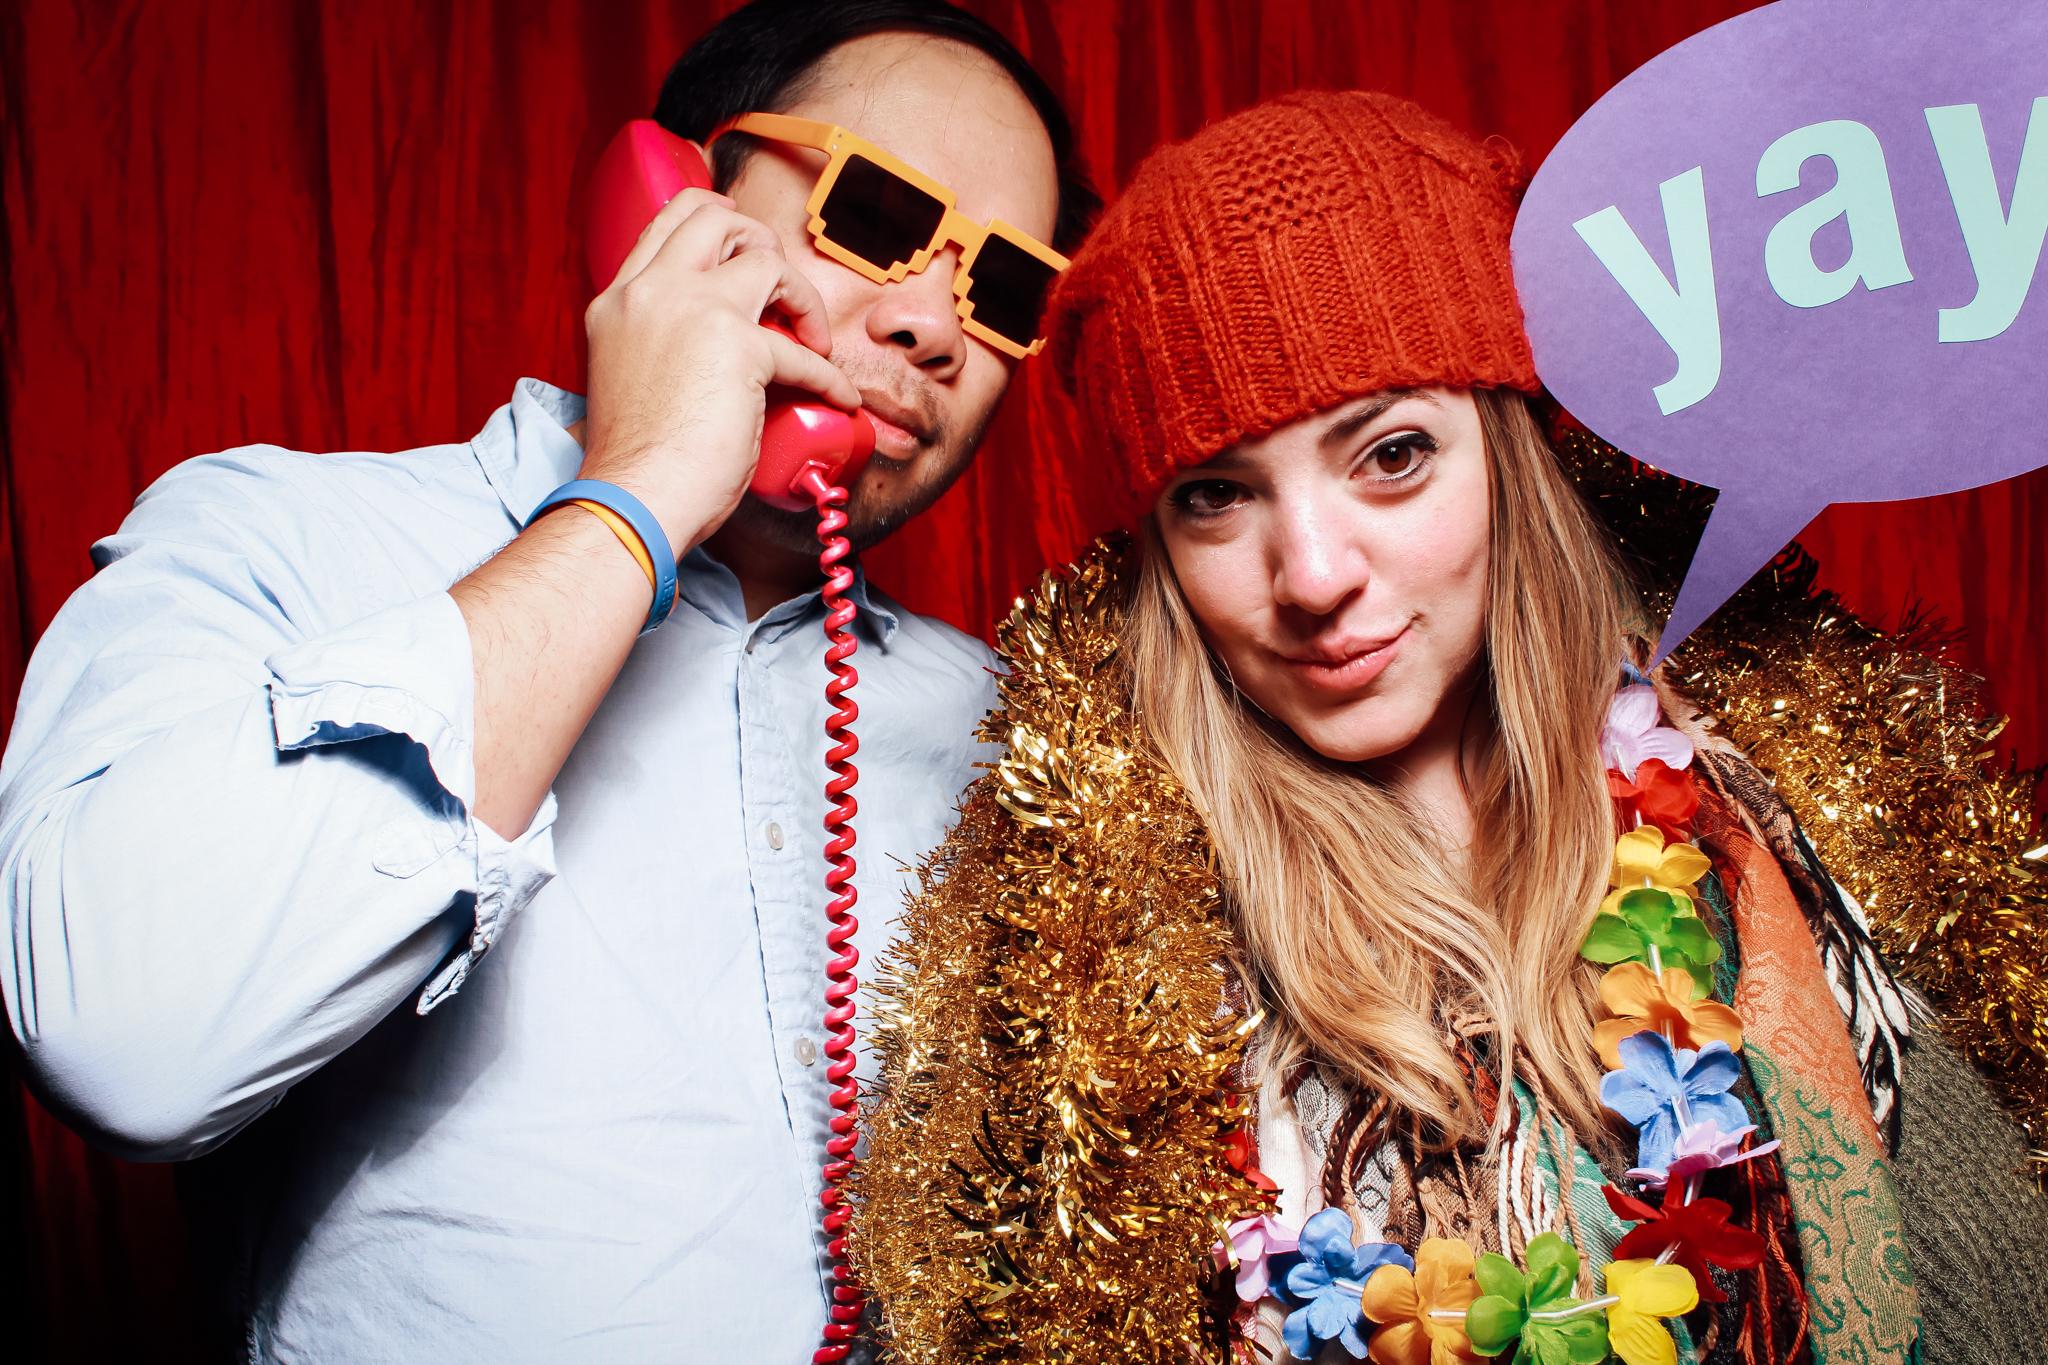 faroutphotobooths-memphis-photobooth-rental-launch-party-loflin-yard (3 of 16).jpg